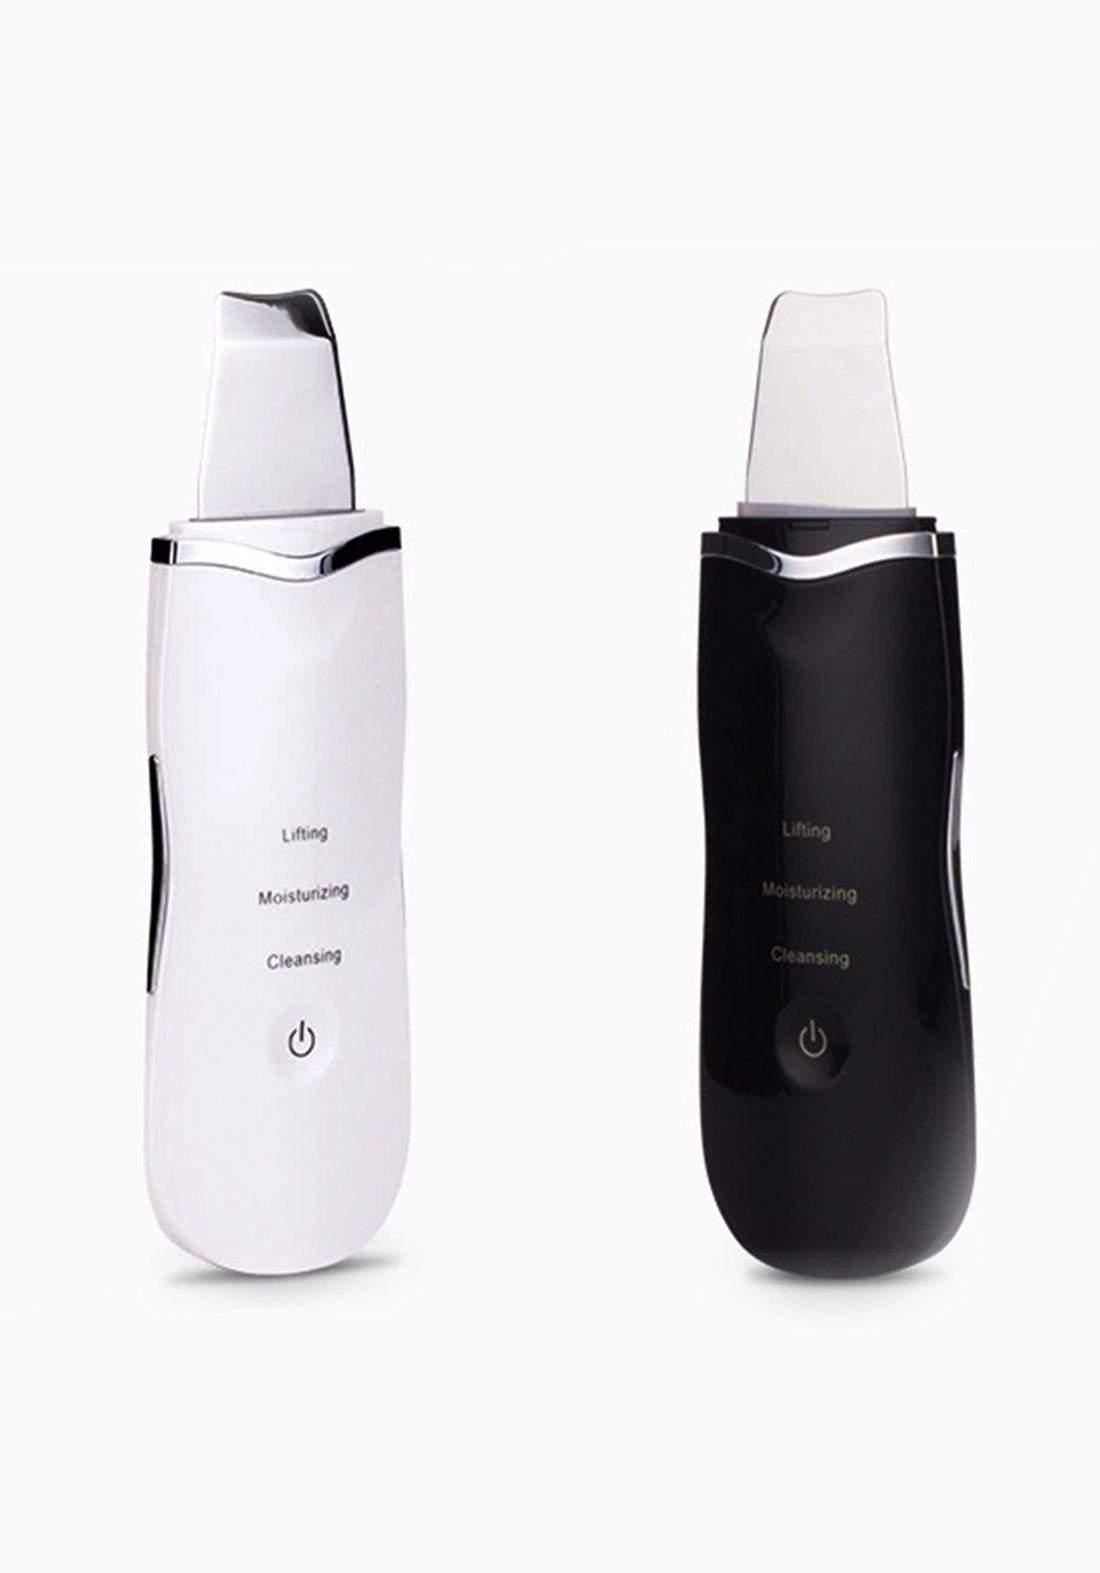 Beauty Instrument Derma Cleansing Pen جهاز تقشير البشرة